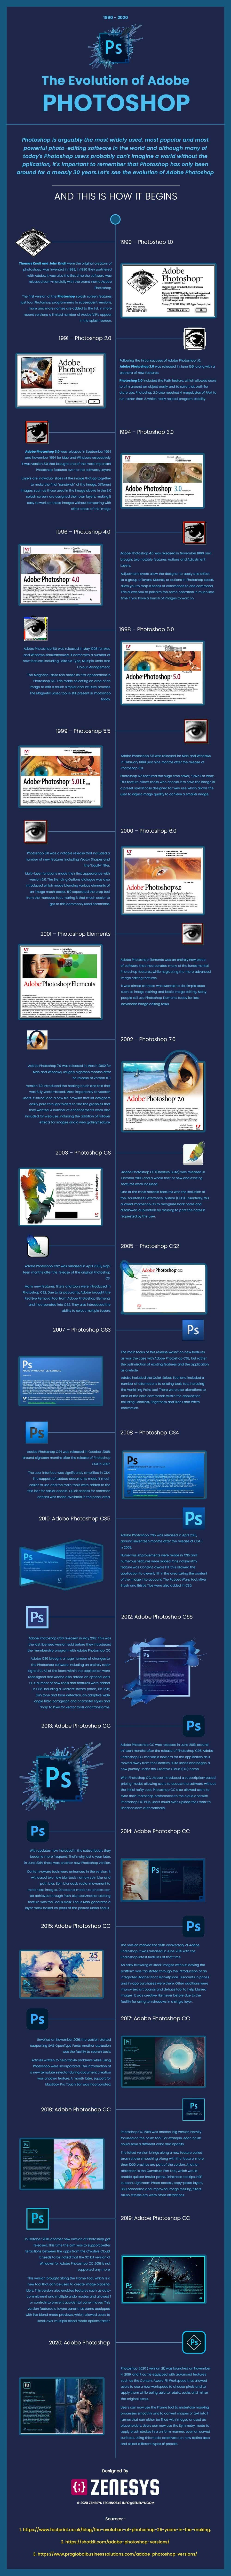 The Evolution of Adobe Photoshop #infographic